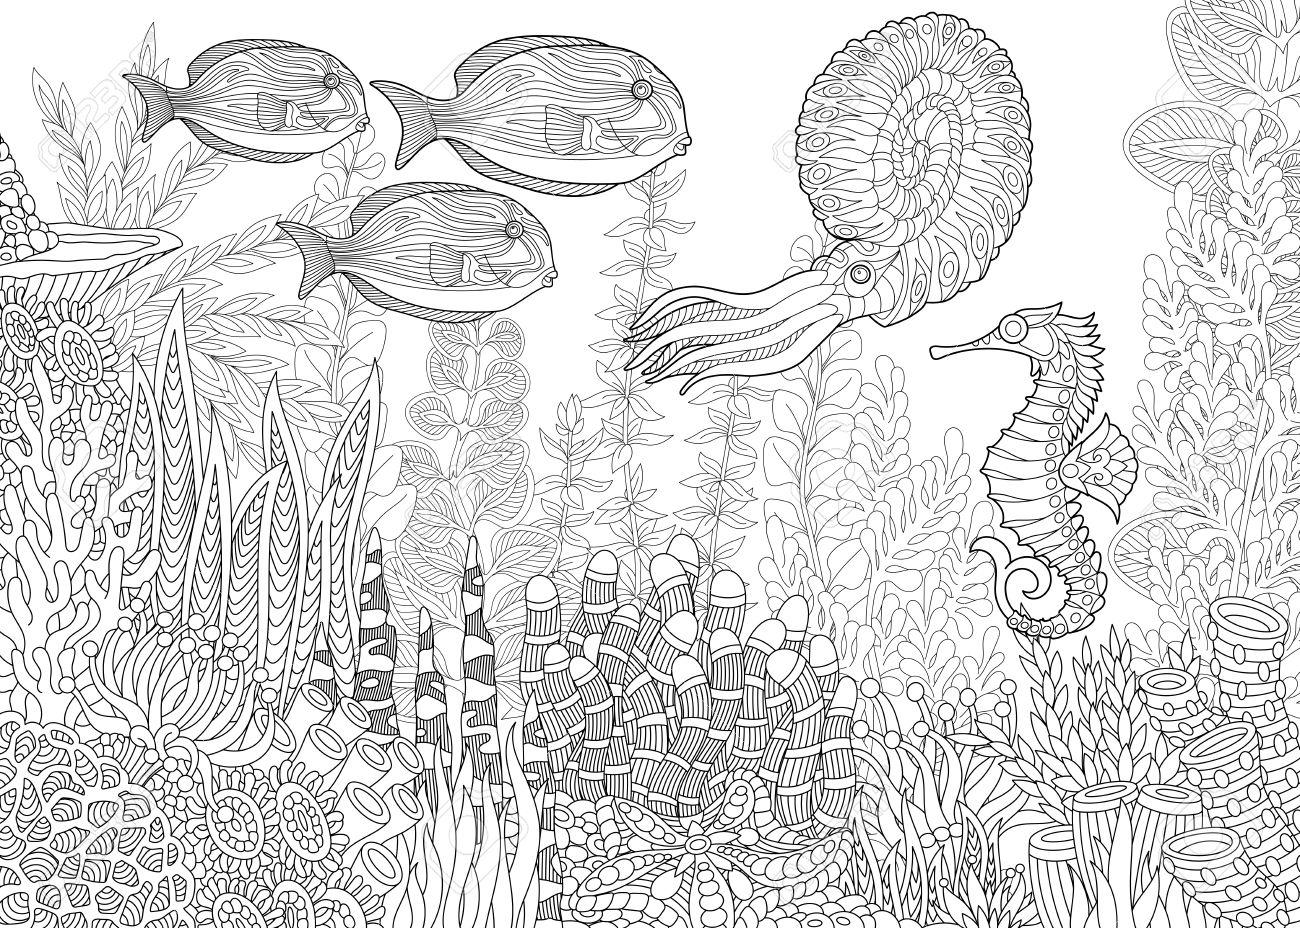 Composición Estilizada De Peces Tropicales, Caballitos De Mar ...